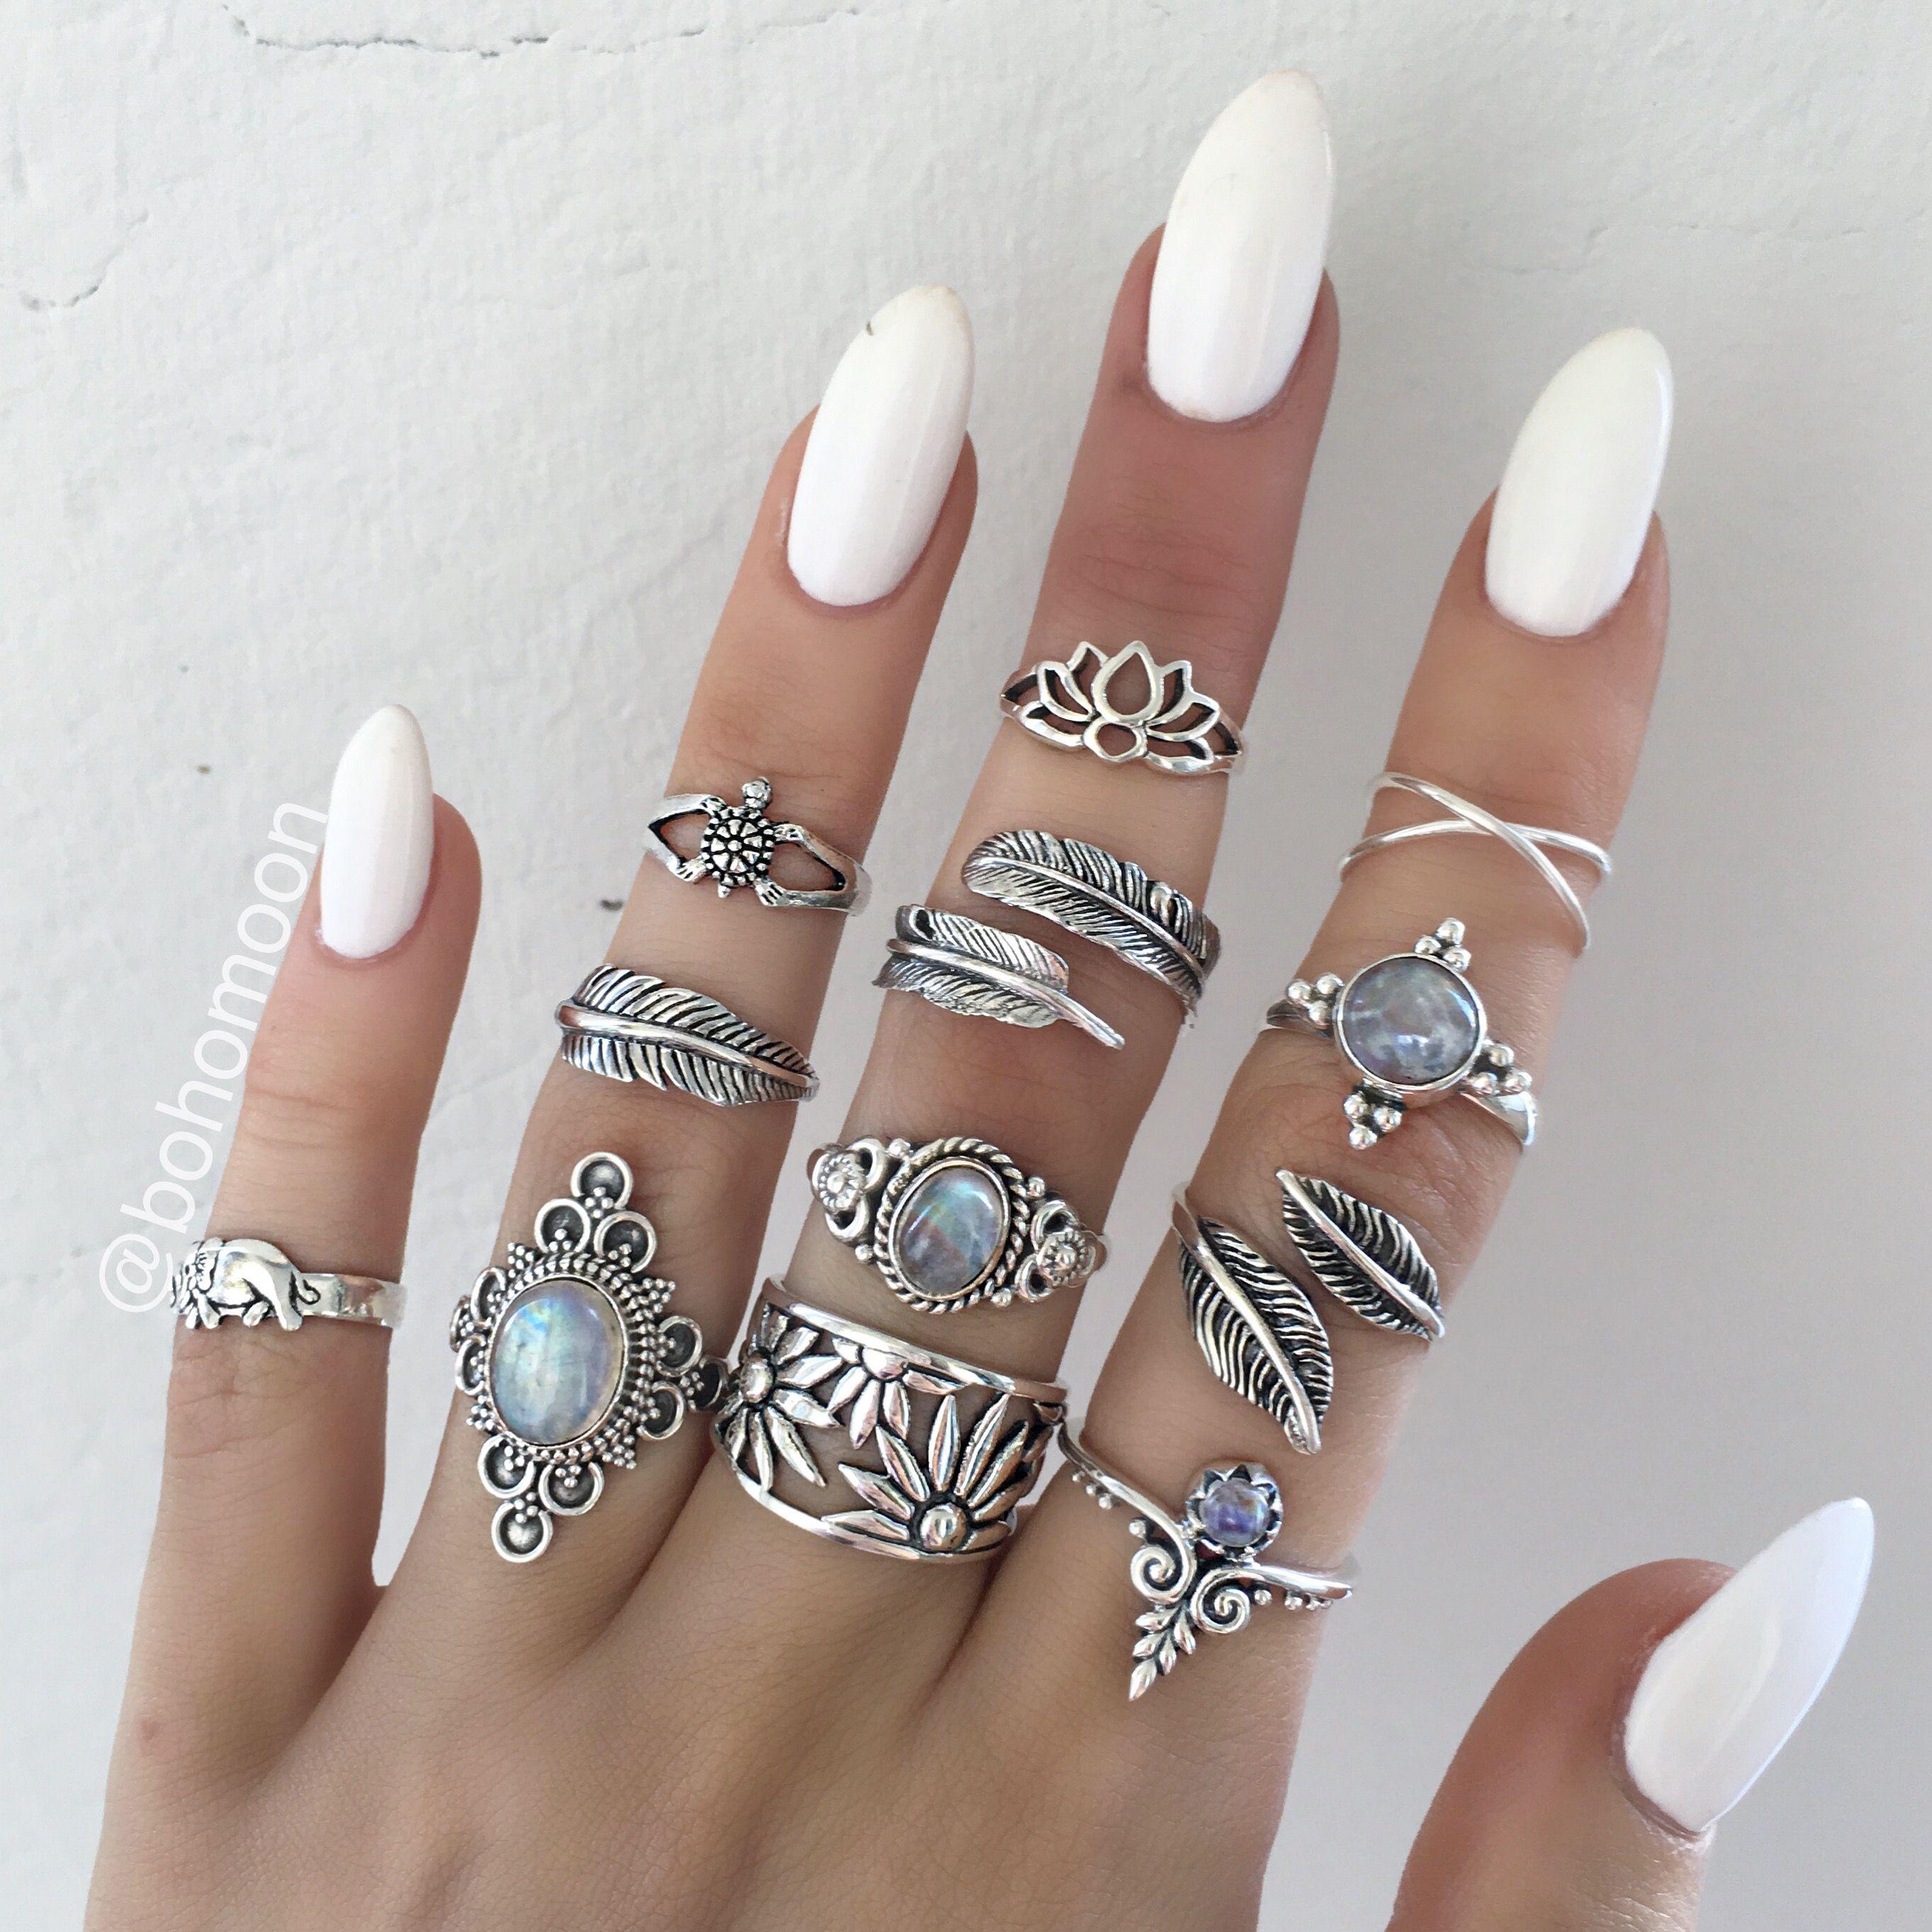 Cute Jewelry Hand Rings Jewelery Silver Boho